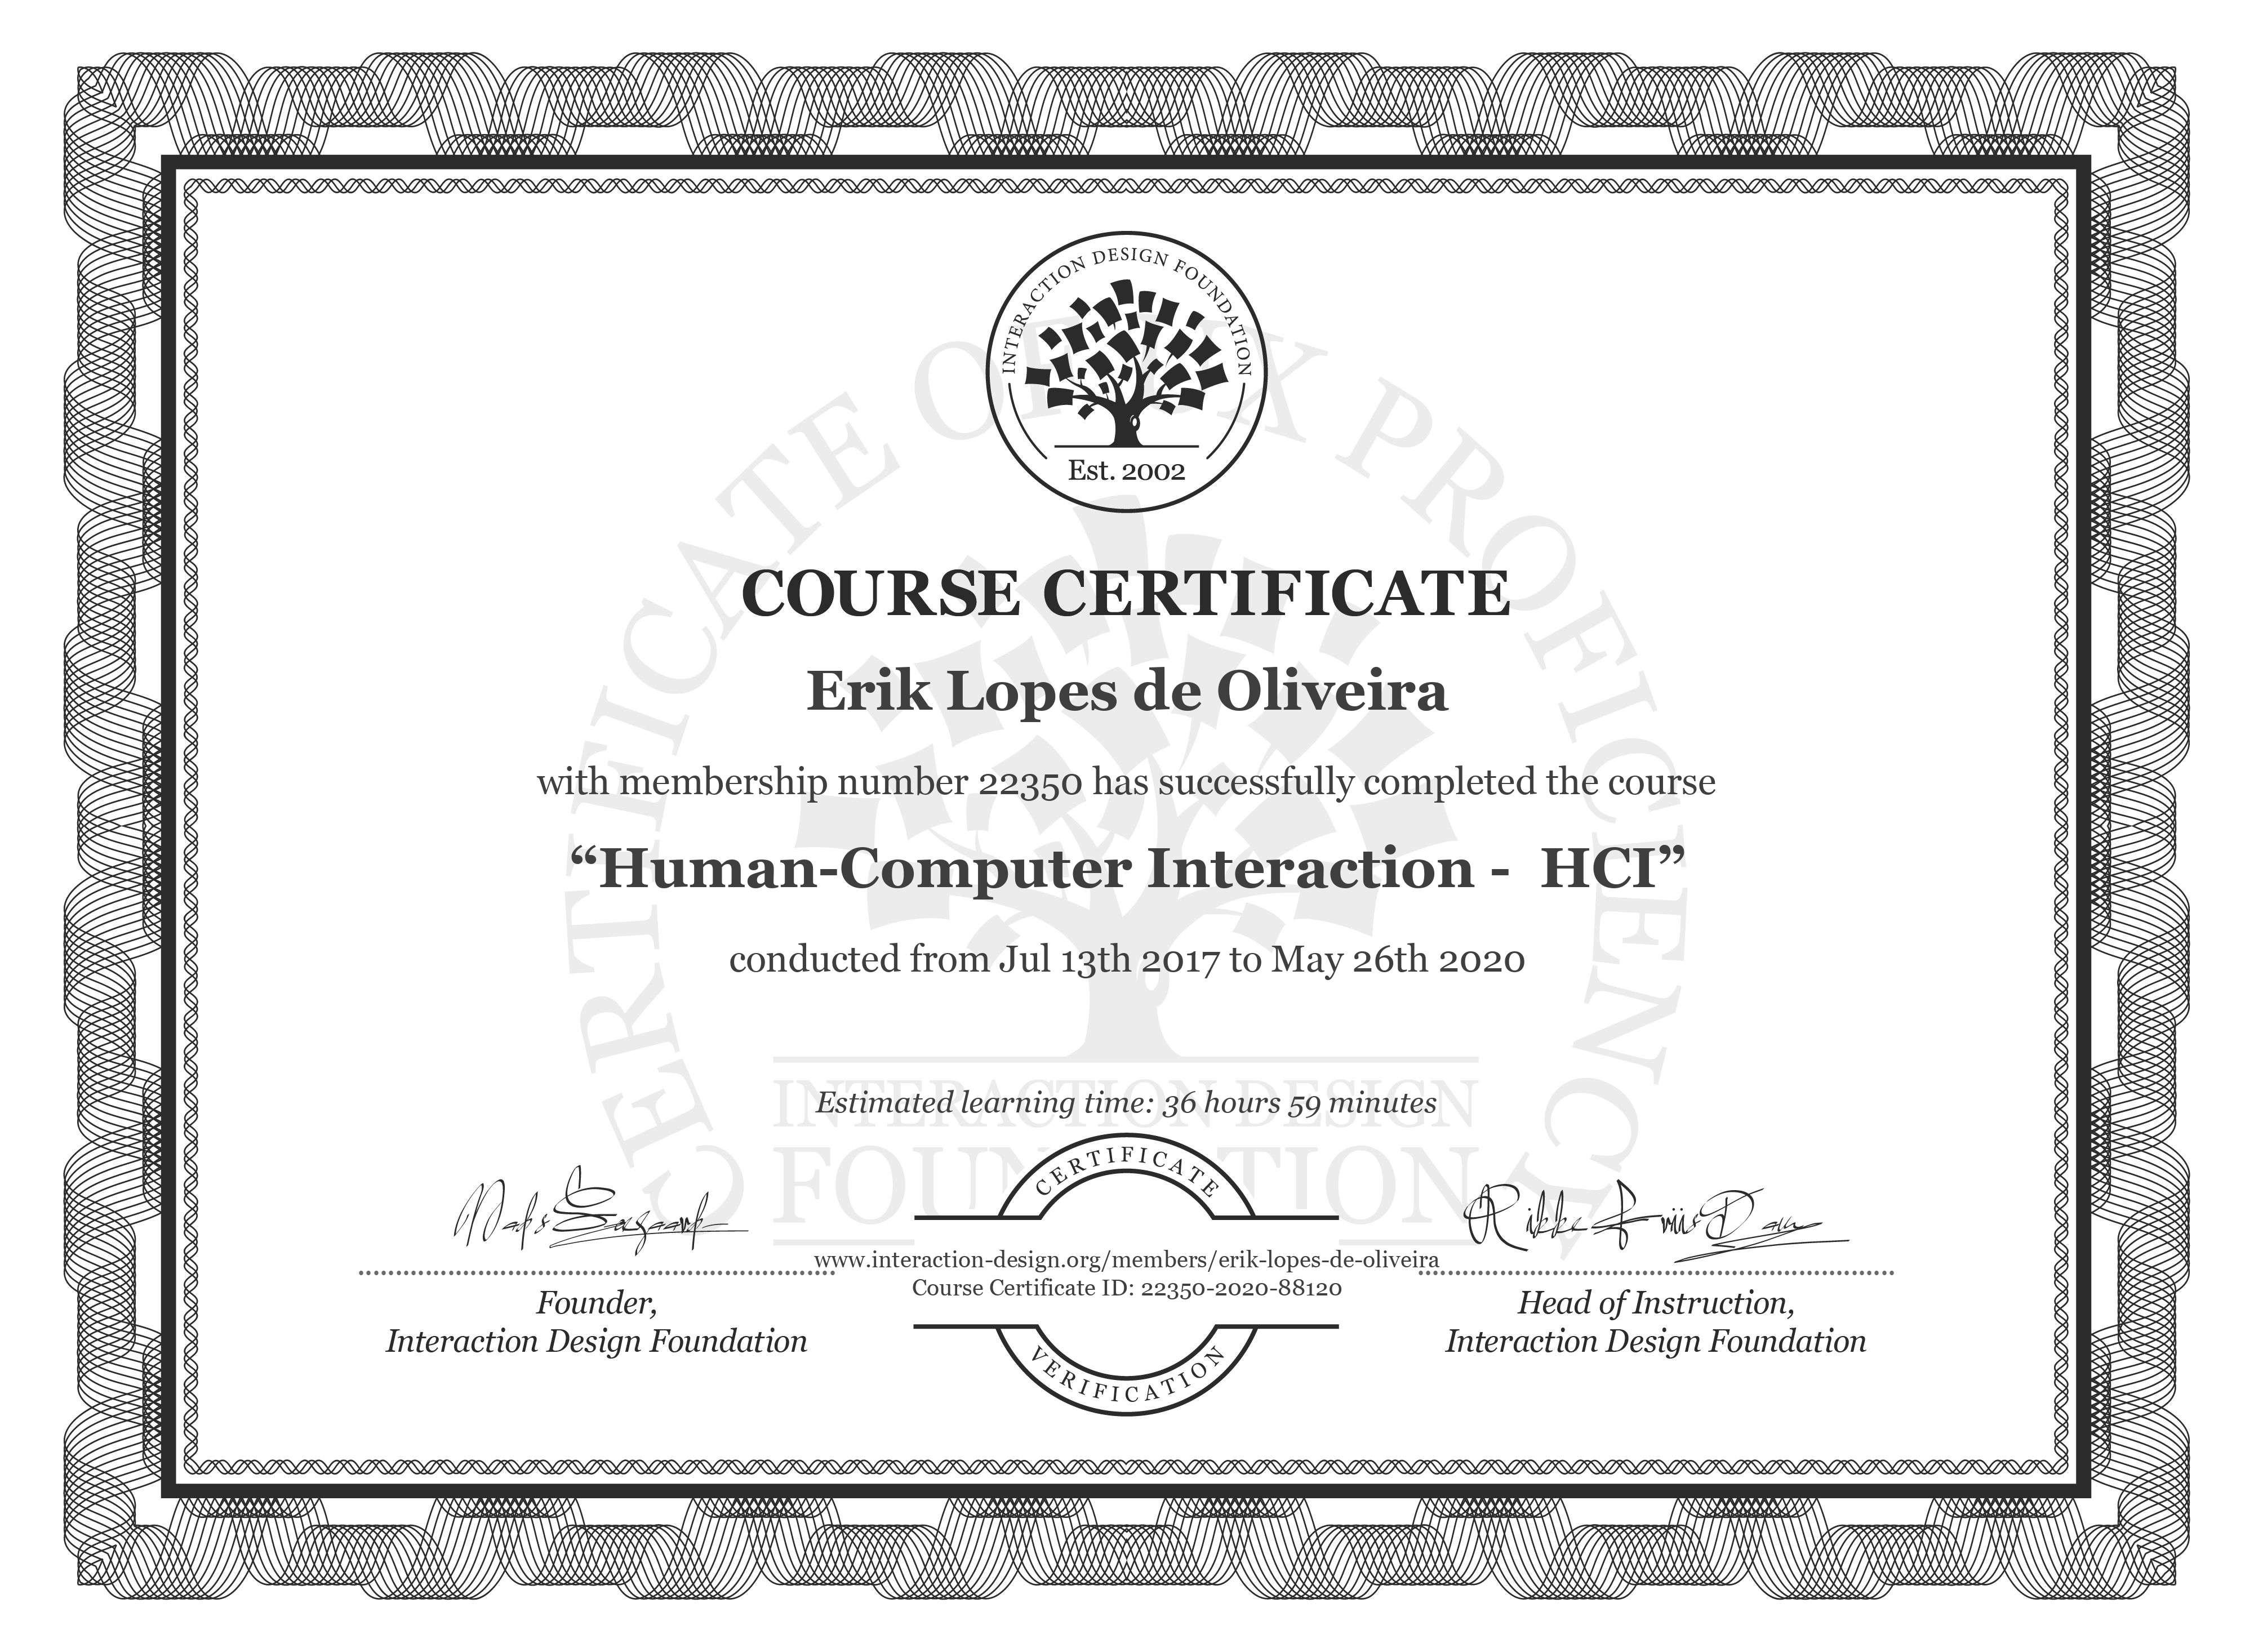 Erik Lopes de Oliveira's Course Certificate: Human-Computer Interaction -  HCI